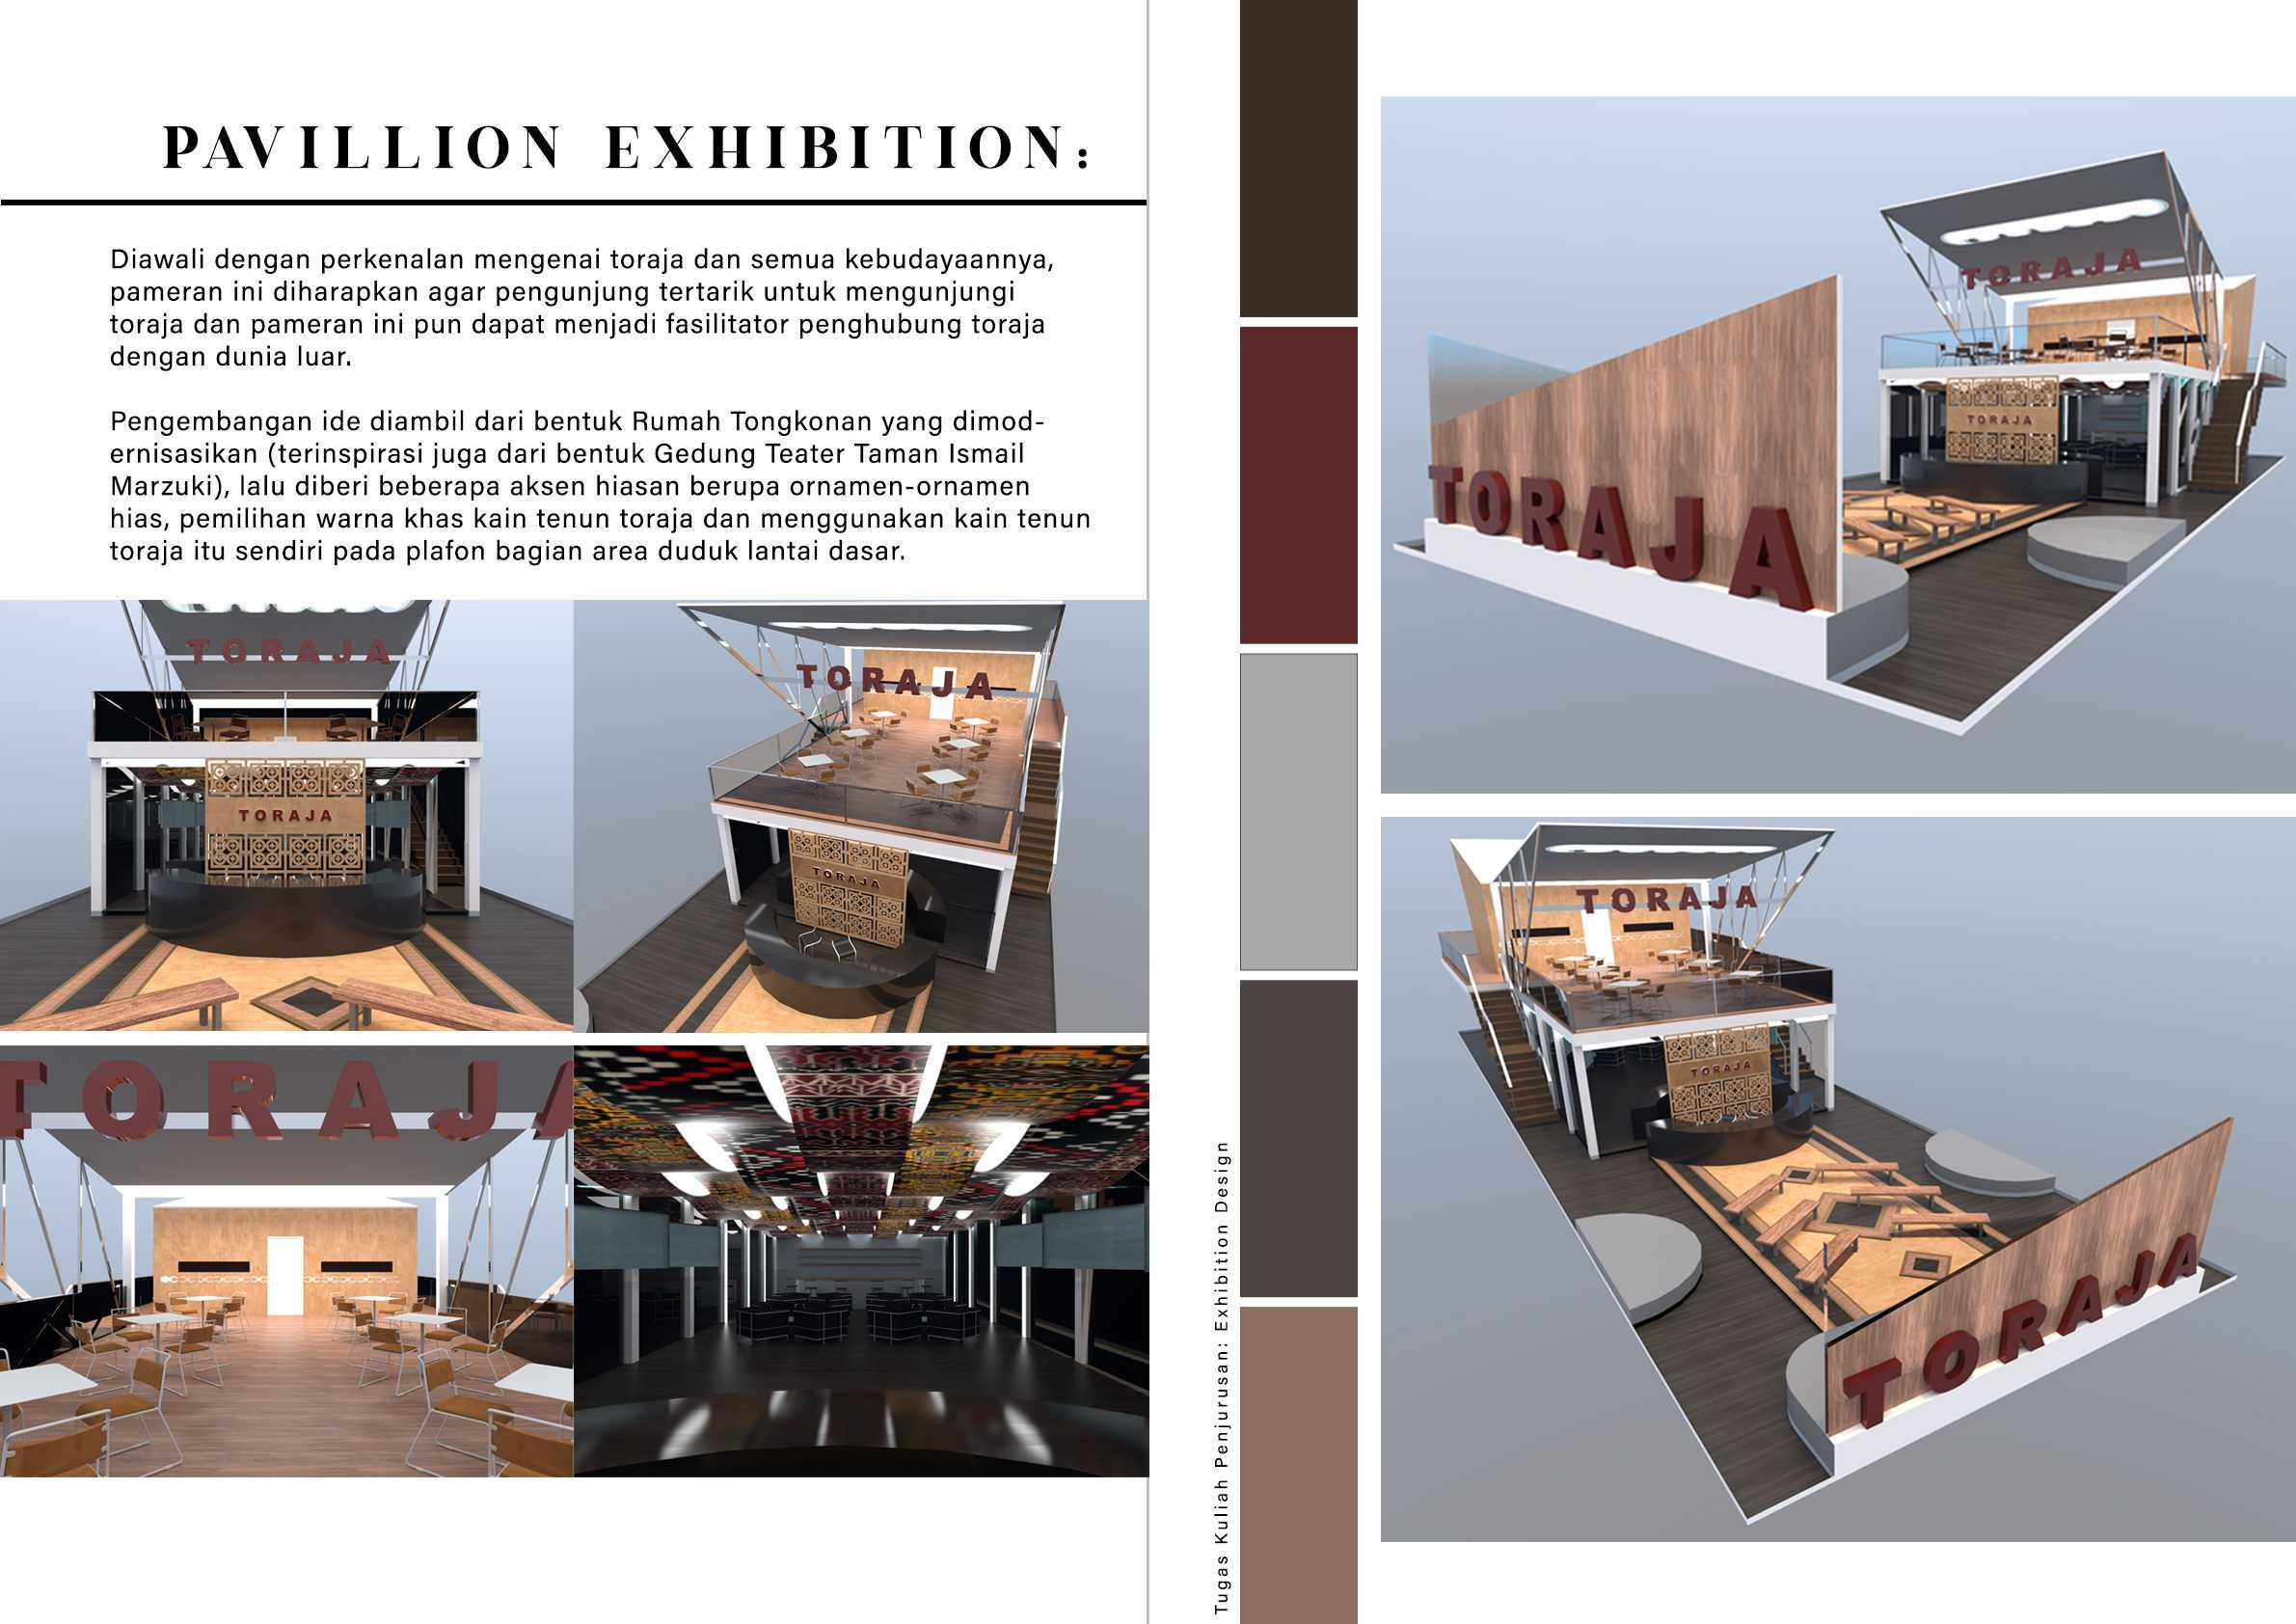 Ferdian Suciokto Exhibition - Toraja Travel Fair Jl. Gatot Subroto No.1, Rt.1/rw.3, Gelora, Kecamatan Tanah Abang, Kota Jakarta Pusat, Daerah Khusus Ibukota Jakarta 10270, Indonesia Jl. Gatot Subroto No.1, Rt.1/rw.3, Gelora, Kecamatan Tanah Abang, Kota Jakarta Pusat, Daerah Khusus Ibukota Jakarta 10270, Indonesia Ferdian-Suciokto-Exhibition-Toraja-Travel-Fair   120936